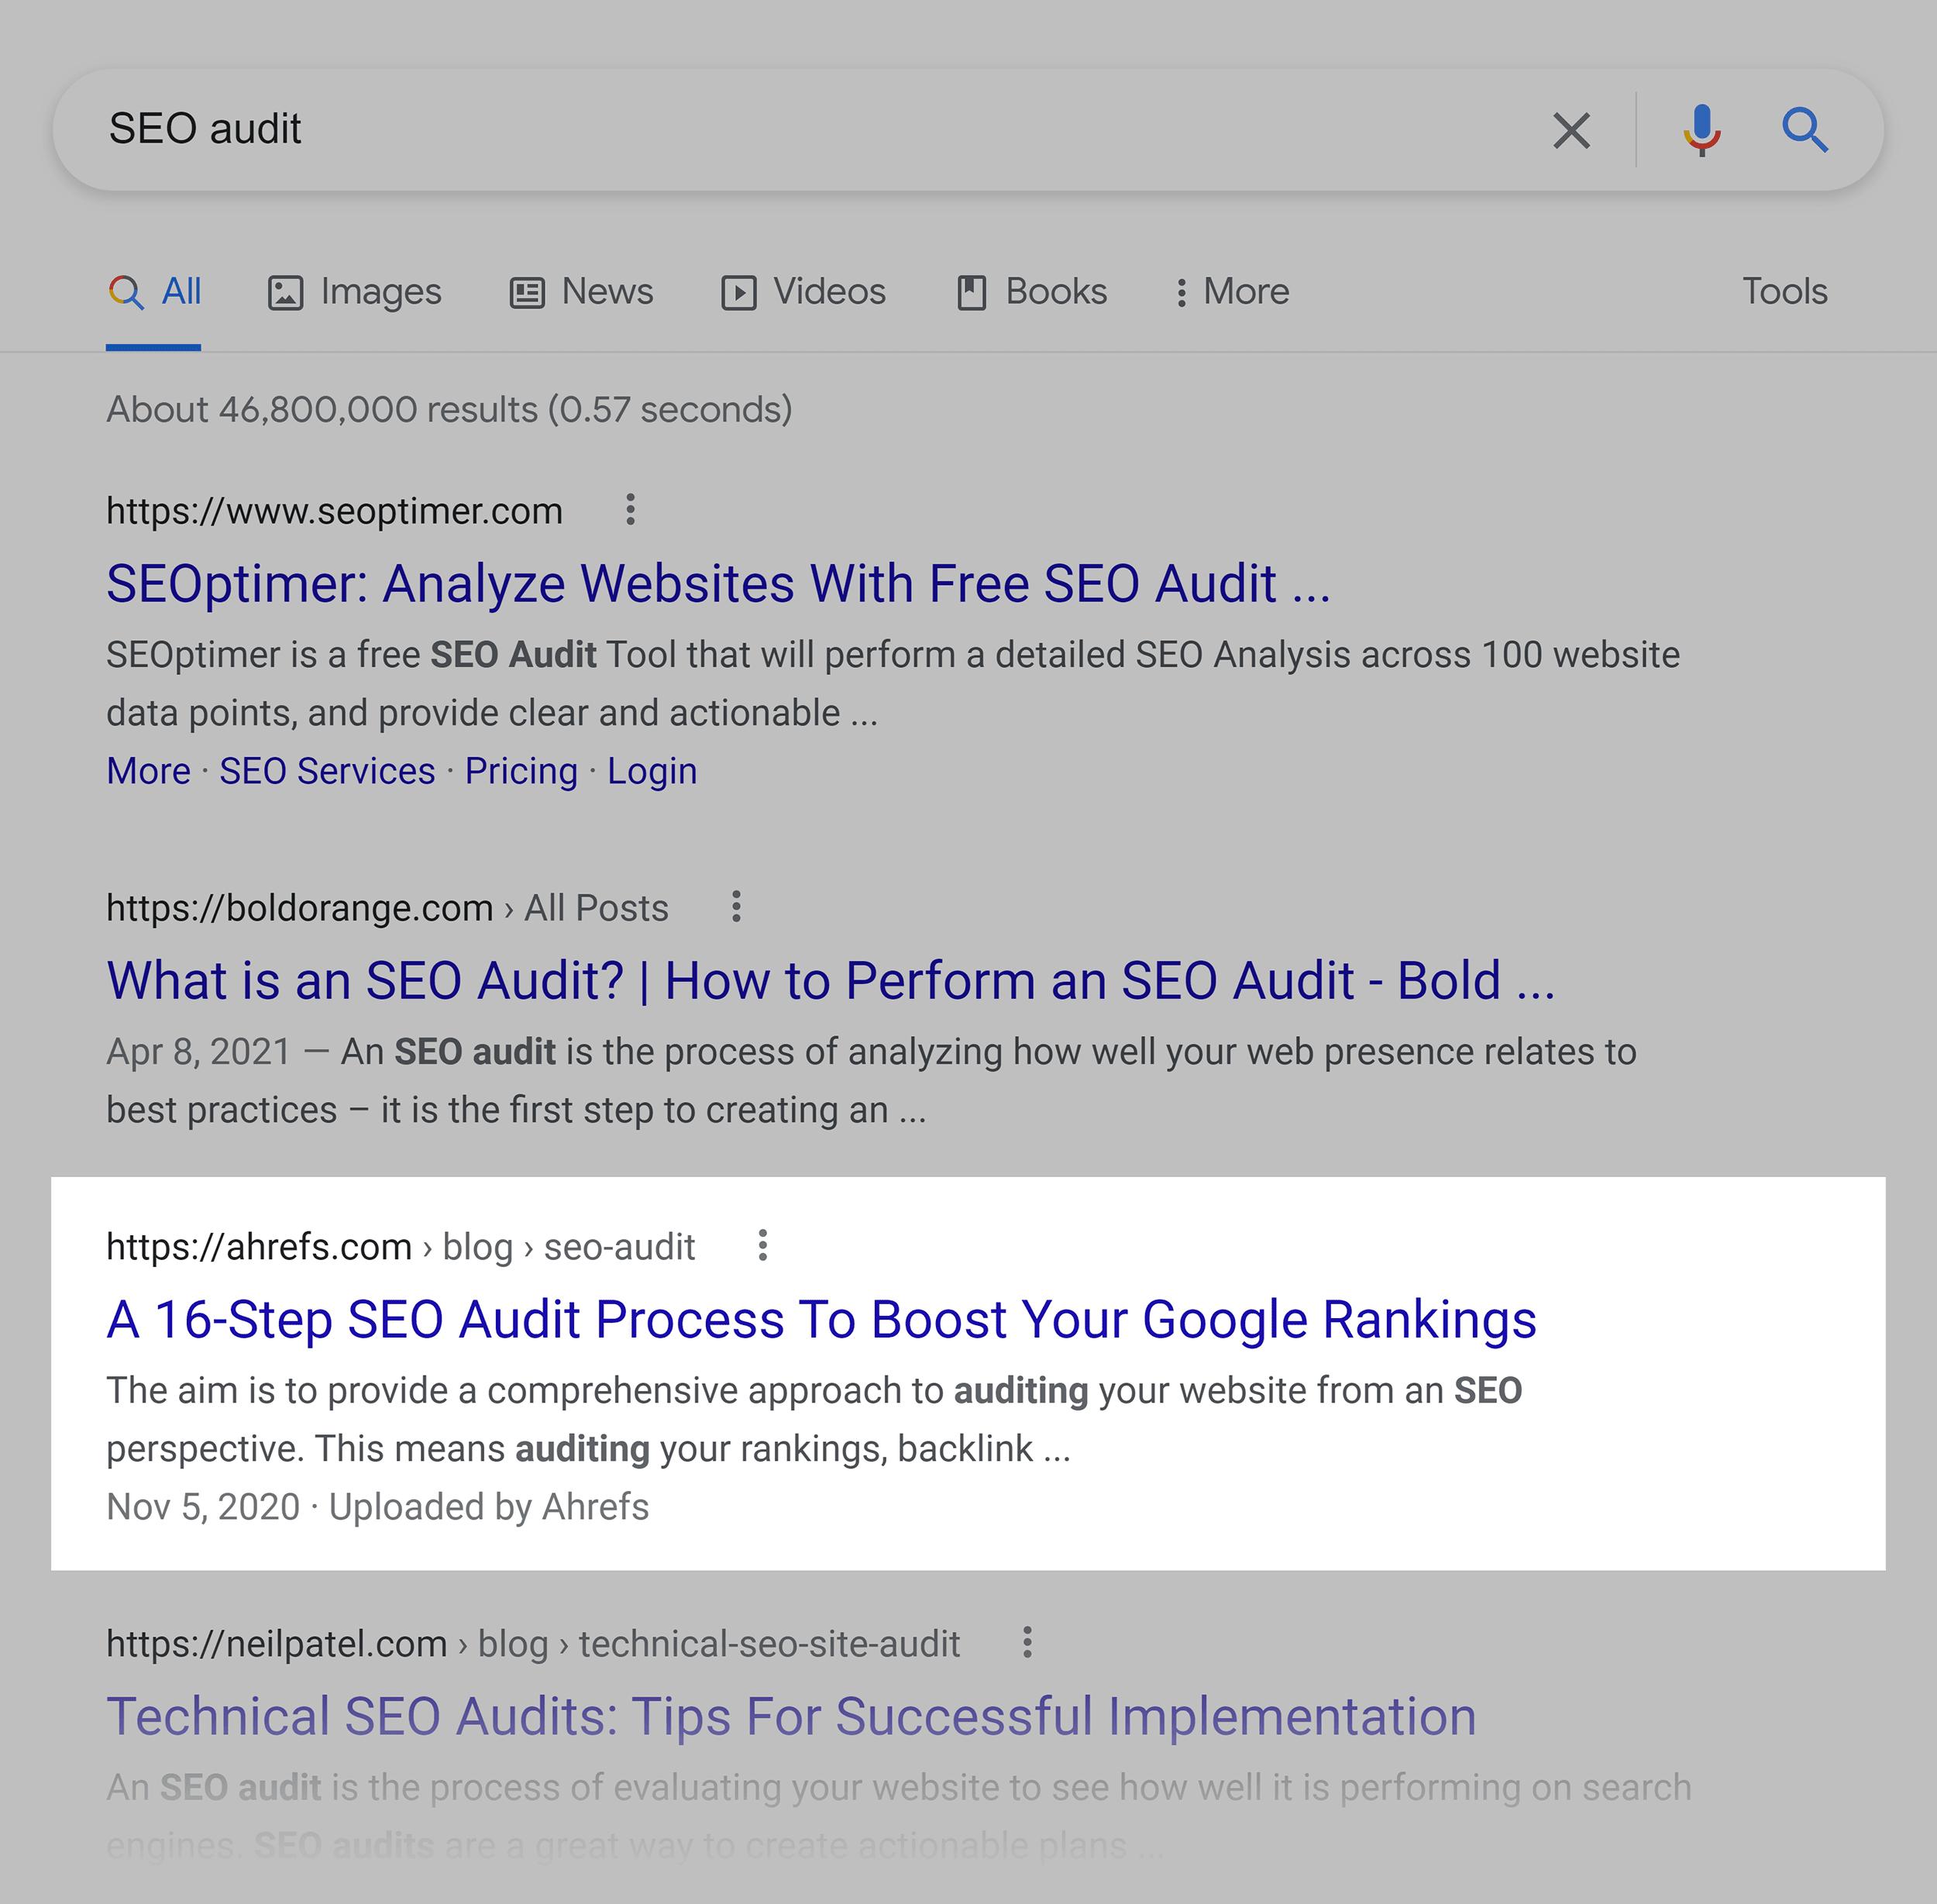 Google SERP – Ahrefs SEO audit post